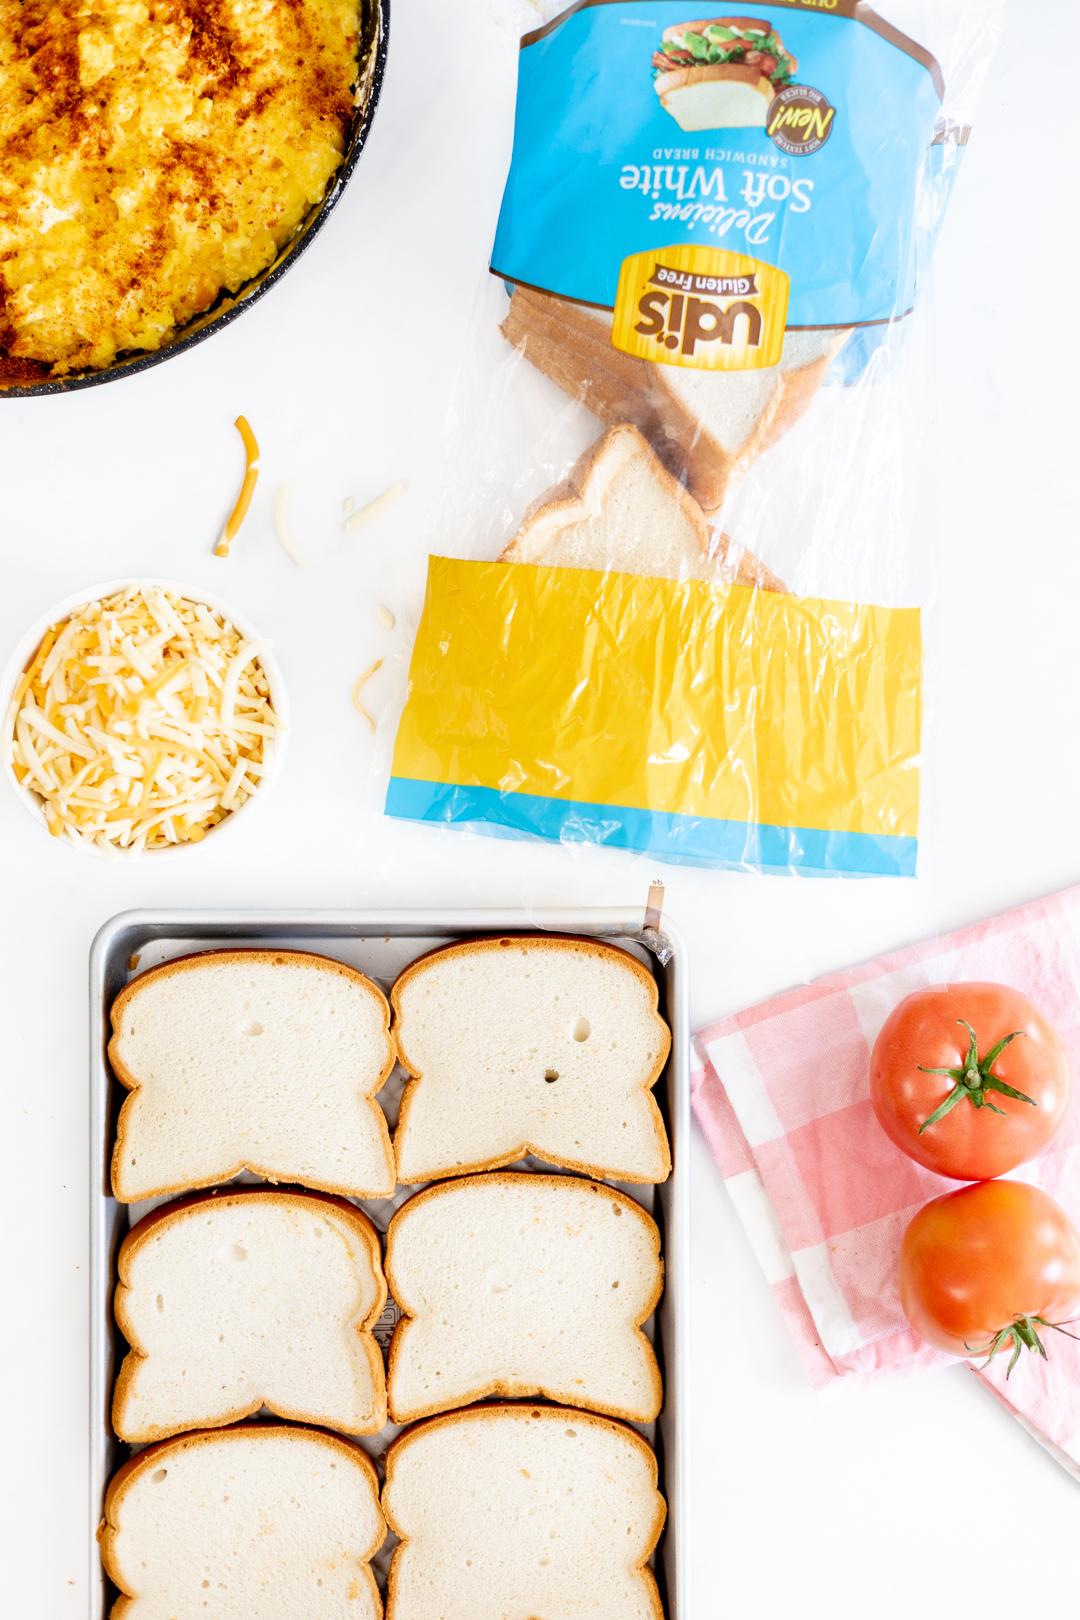 sandwich ingredients with gluten free bread